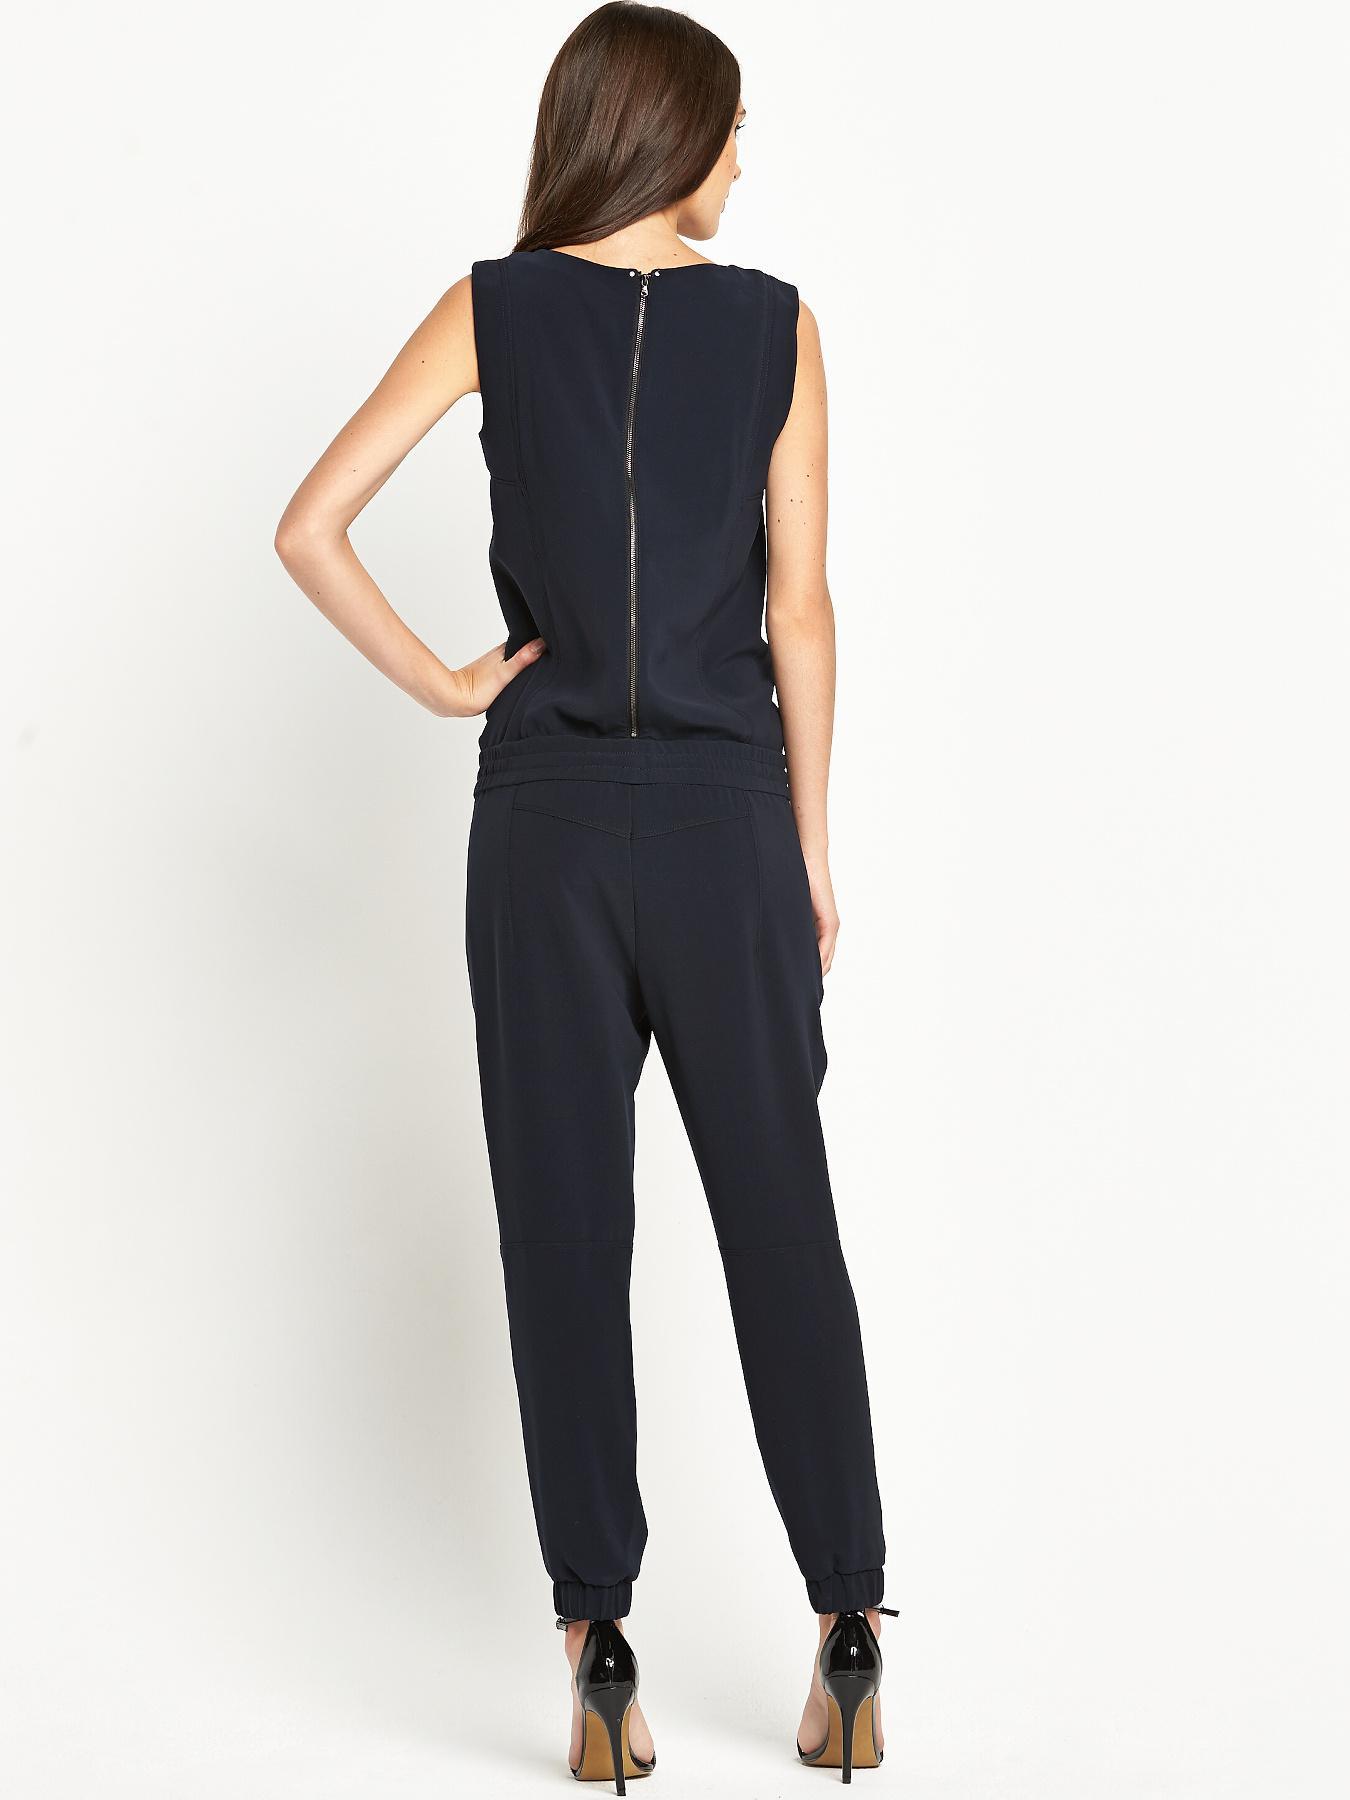 g star raw numu jumpsuit in blue mazarine blue lyst. Black Bedroom Furniture Sets. Home Design Ideas